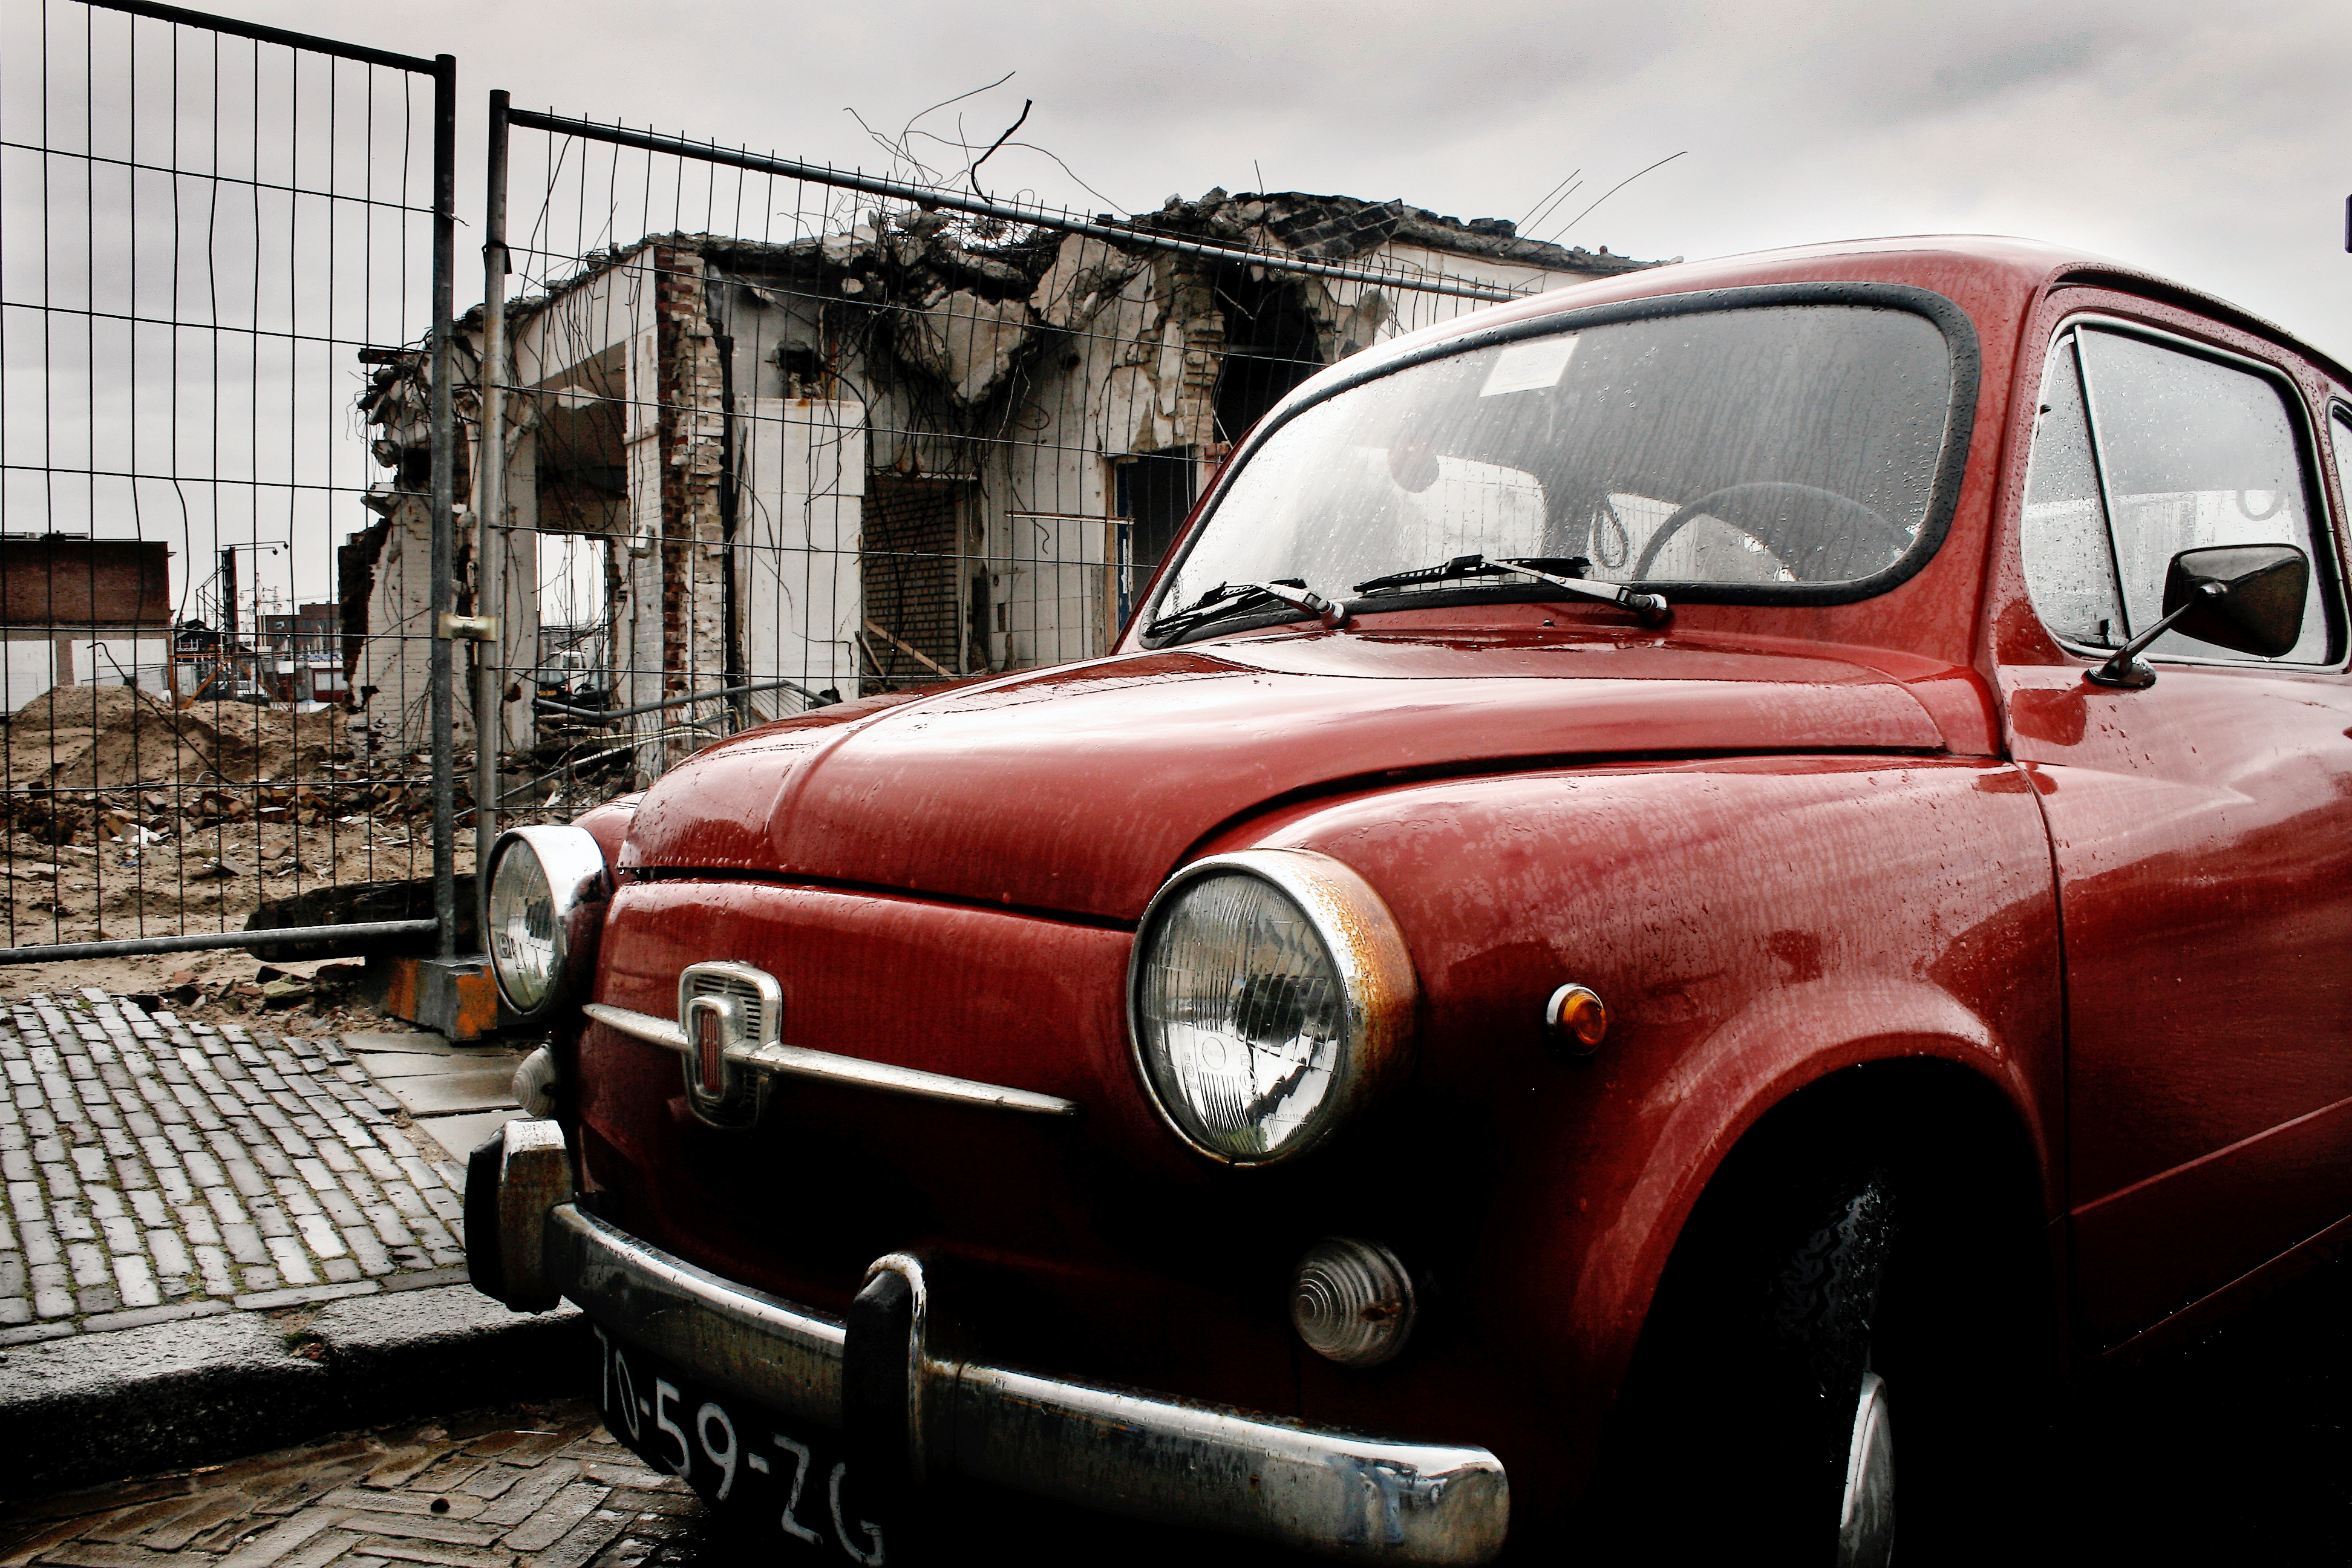 Fiat mini classic car, Abandoned, Vintage, Urban, Transportation, HQ Photo